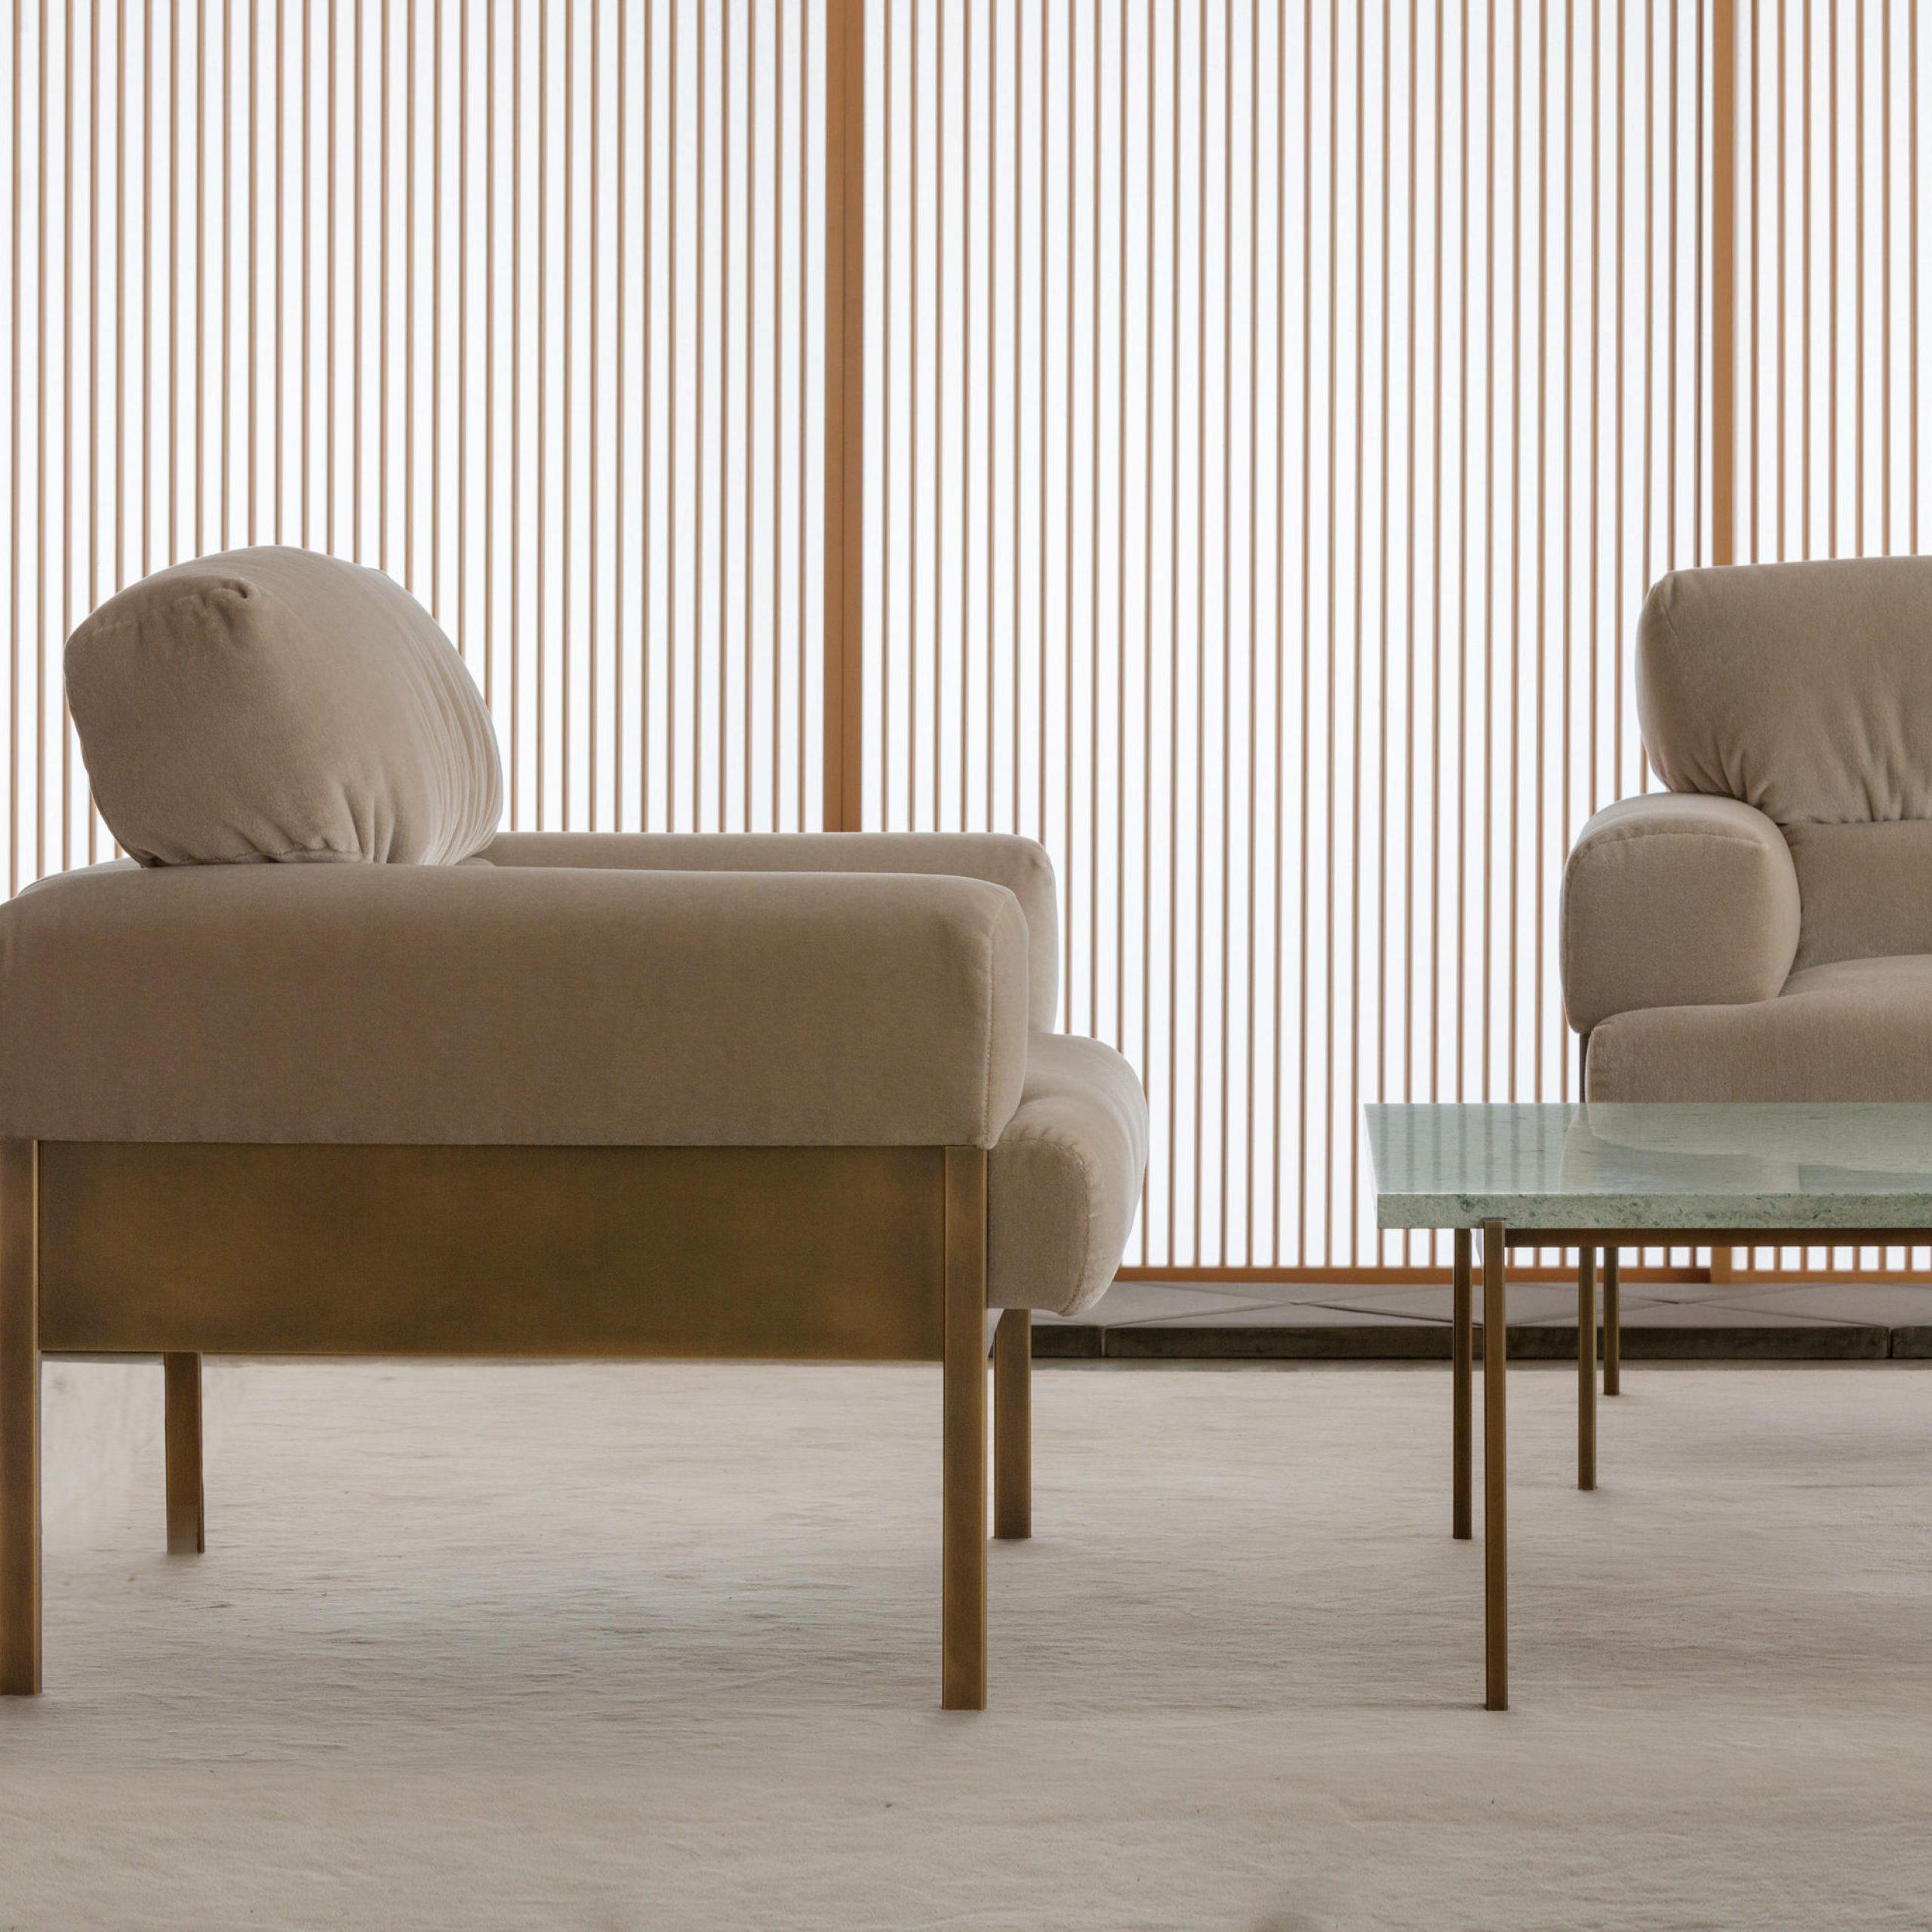 Suki | Armchair & Designer Furniture | Architonic With Suki Armchairs (Photo 2 of 15)